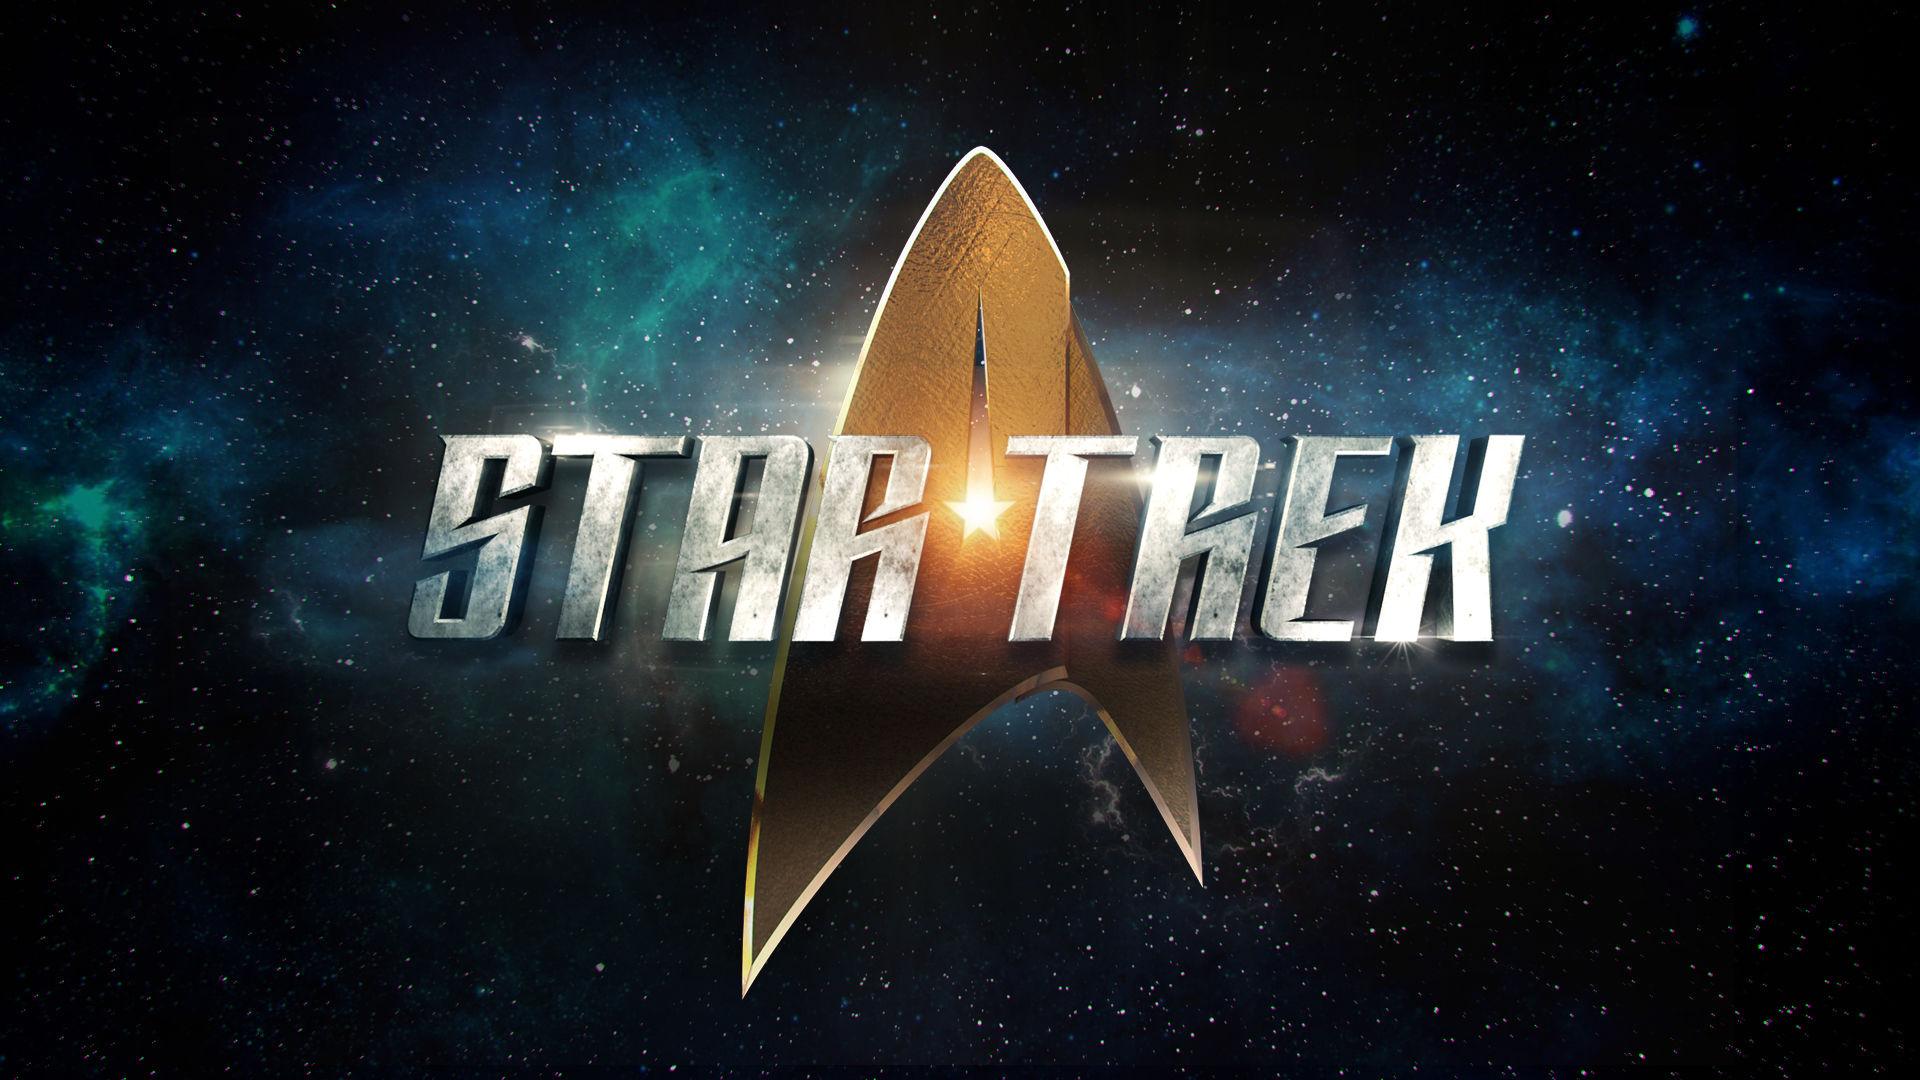 Star Trek: annunciati diversi nuovi progetti per il franchise thumbnail